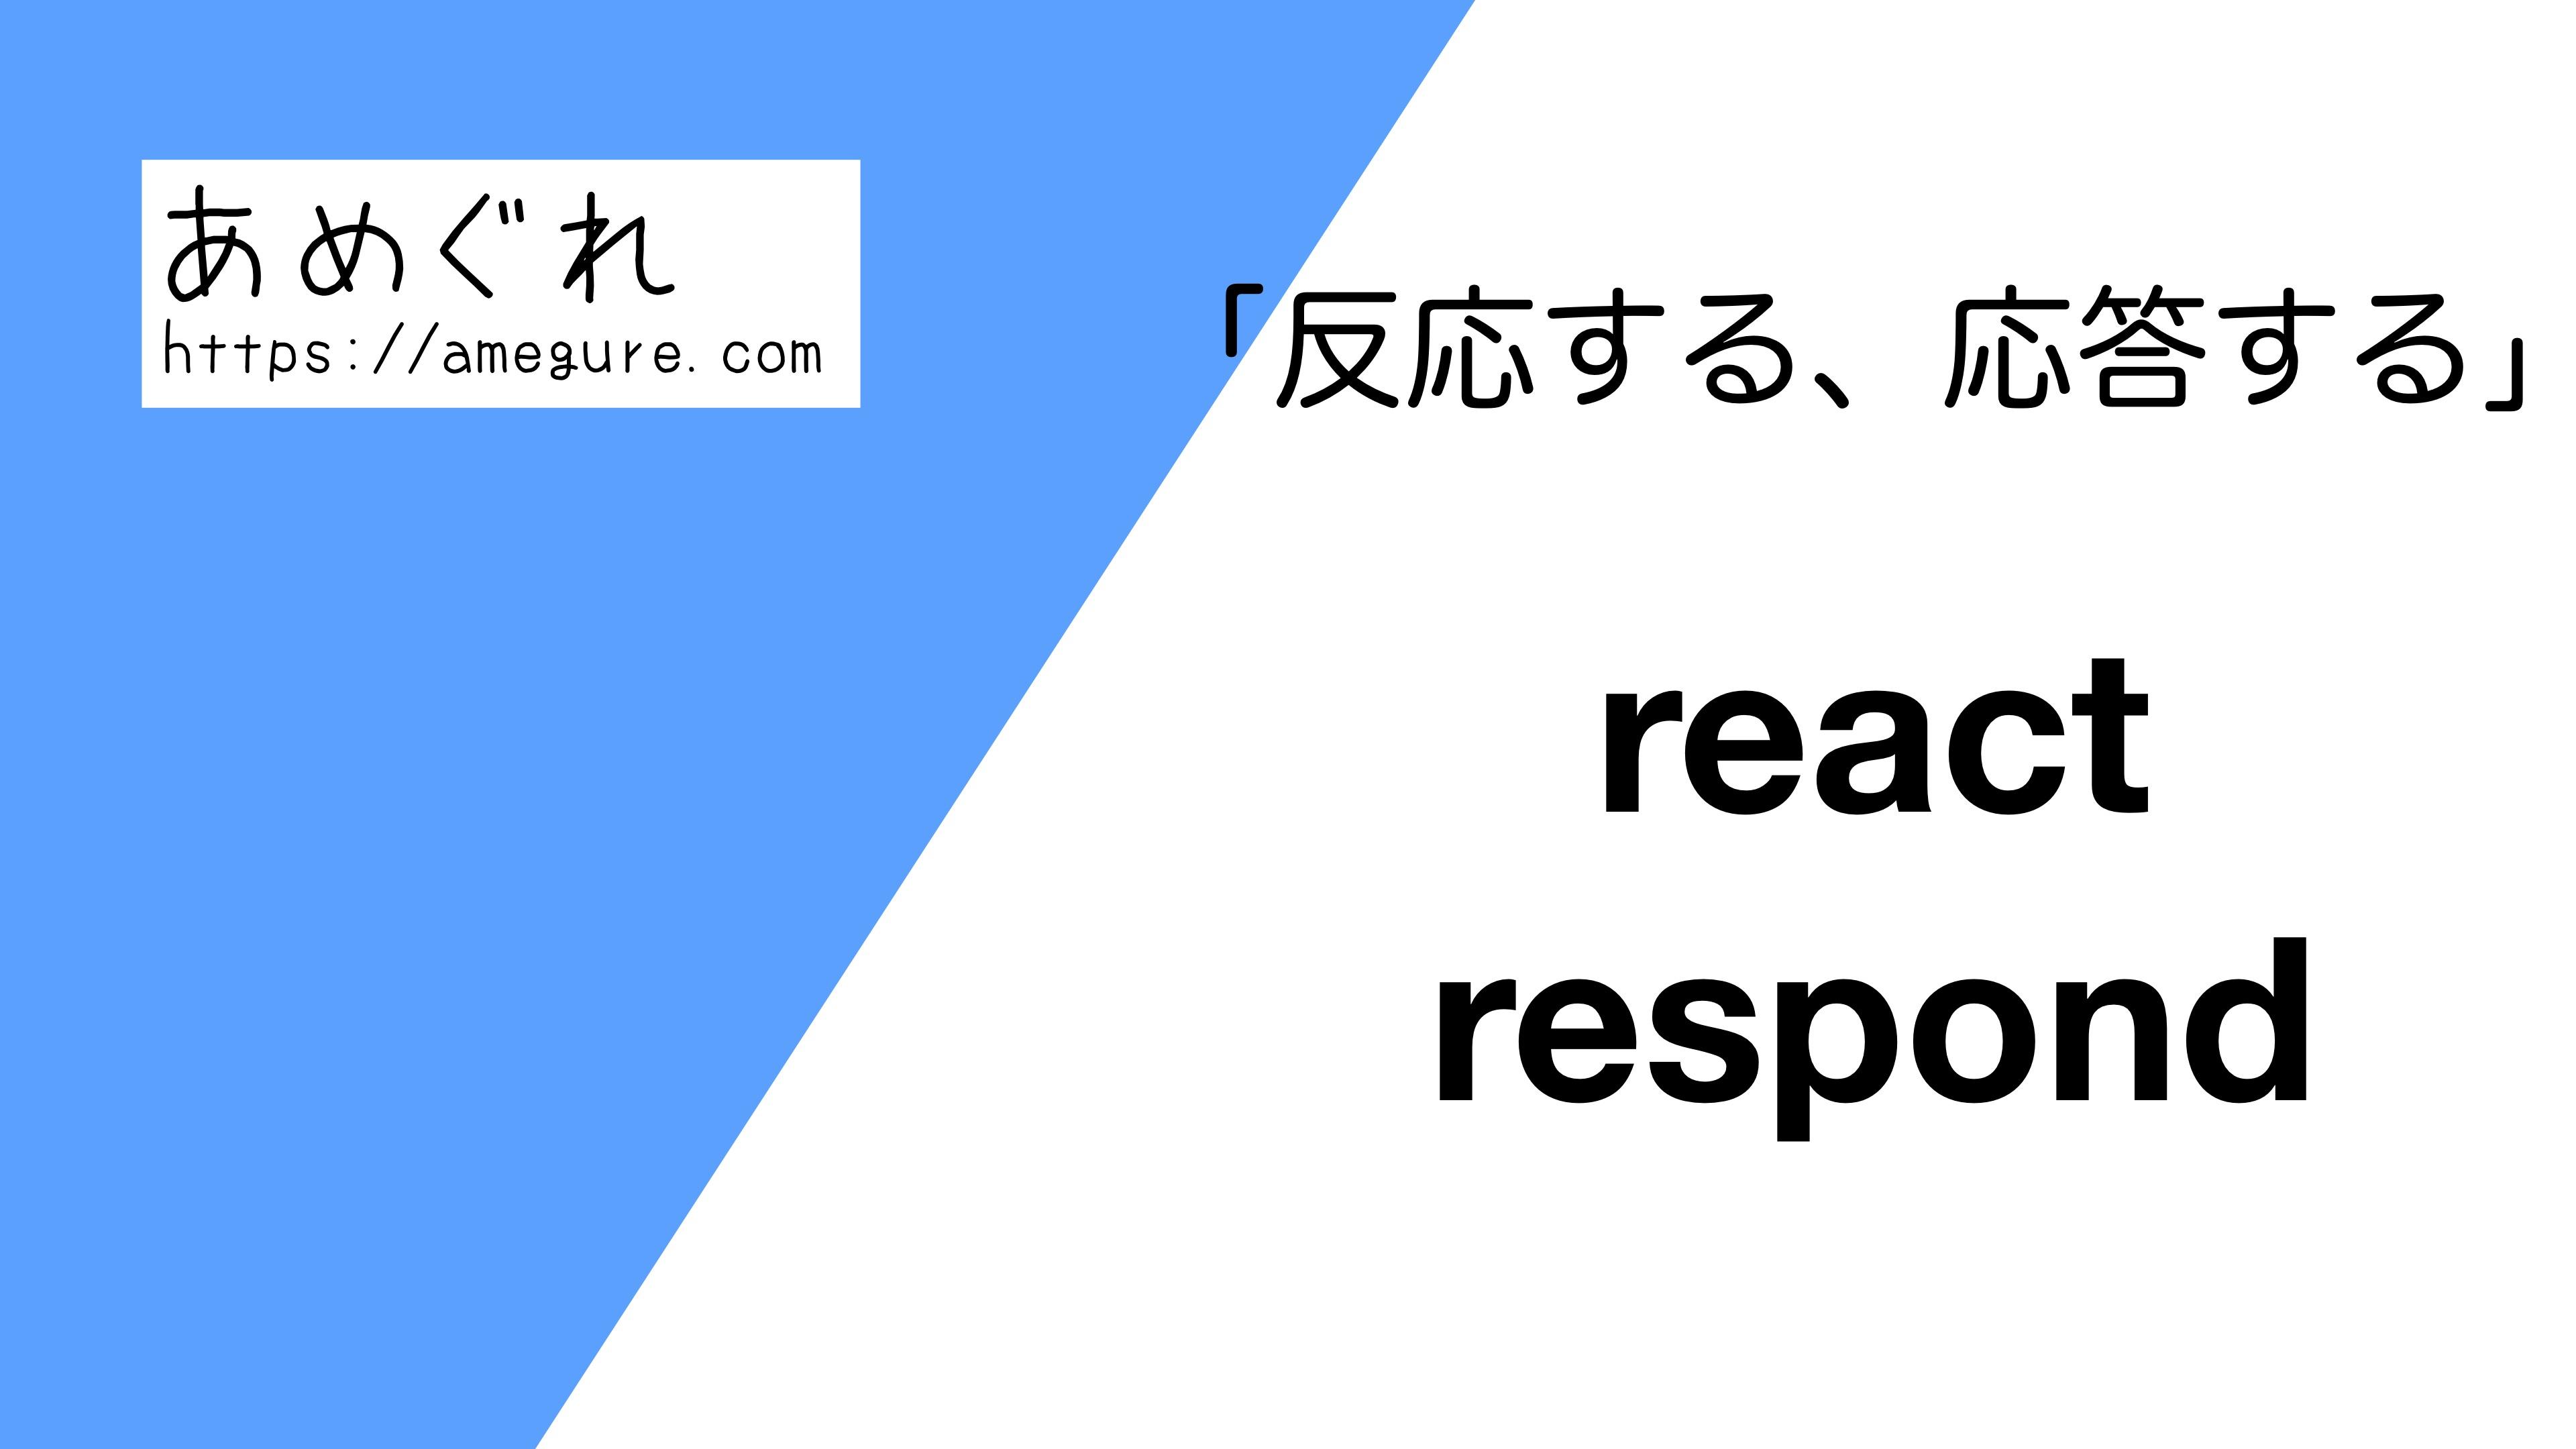 react-respond違い